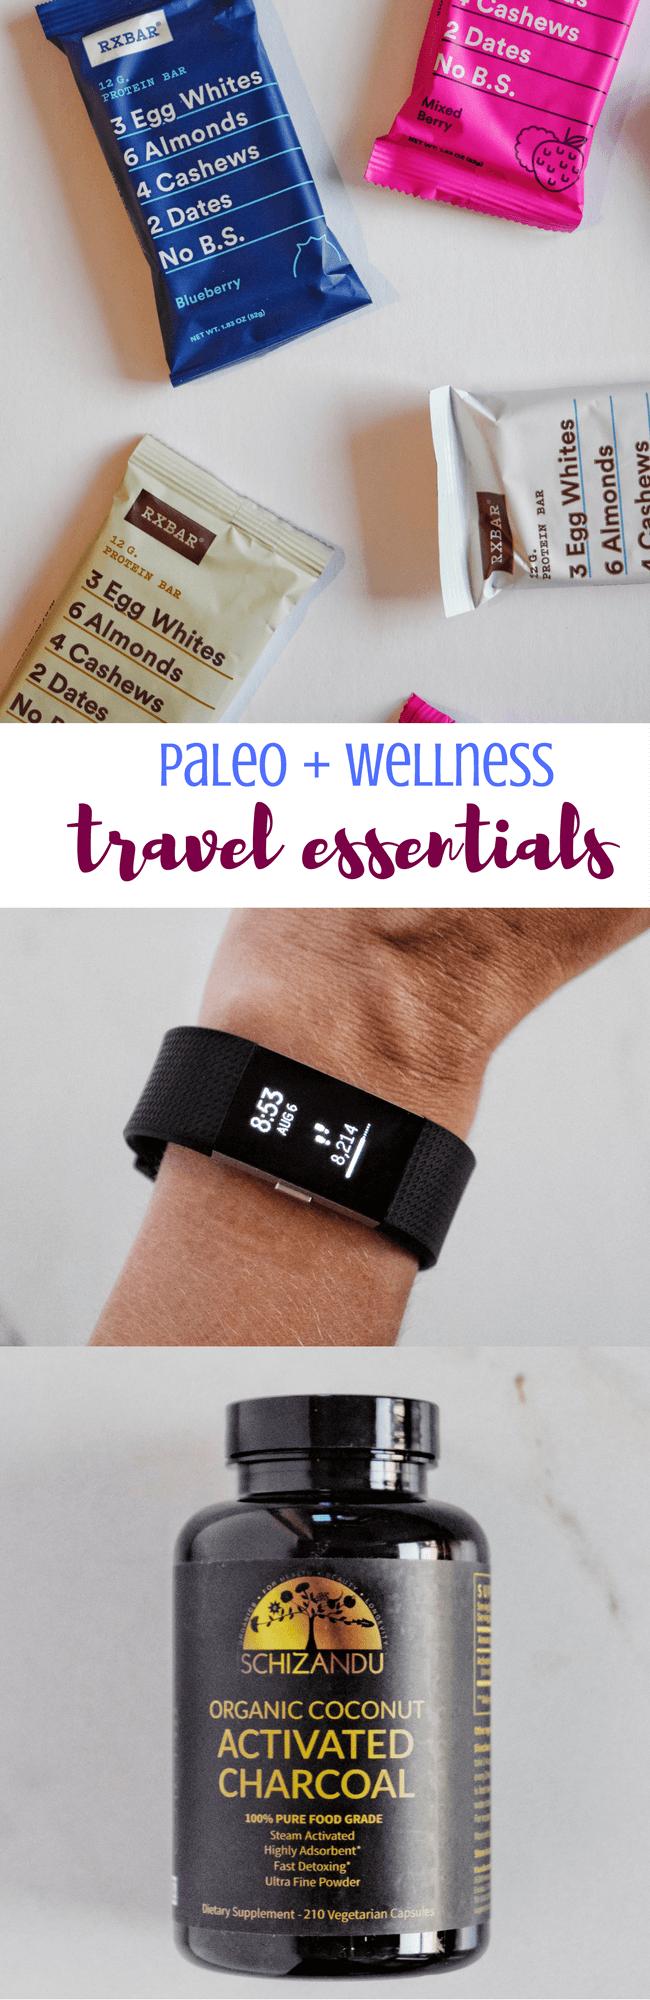 Paleo + Wellness Travel Essentials | Personally Paleo